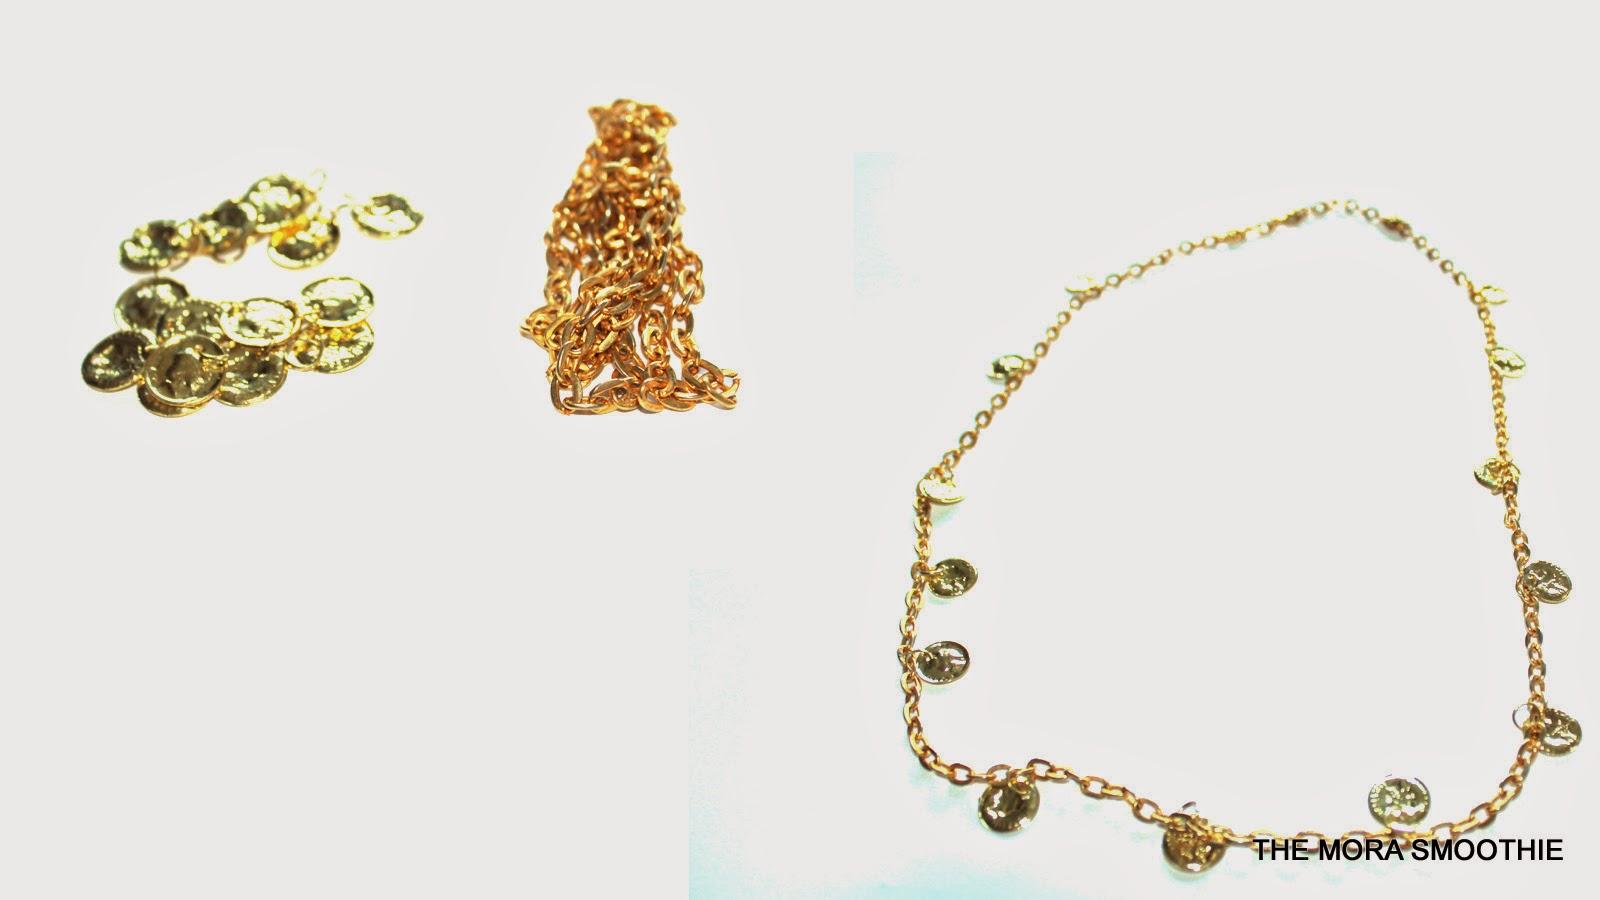 diy, themorasmoothie, fashion, faashion necklace, diy necklace, diyblog, diy blogger, fashionblog, fashionblogger, italianblogger, blogger, tutorial, tutorial necklace, step by step, craft, diycraft, diyproject